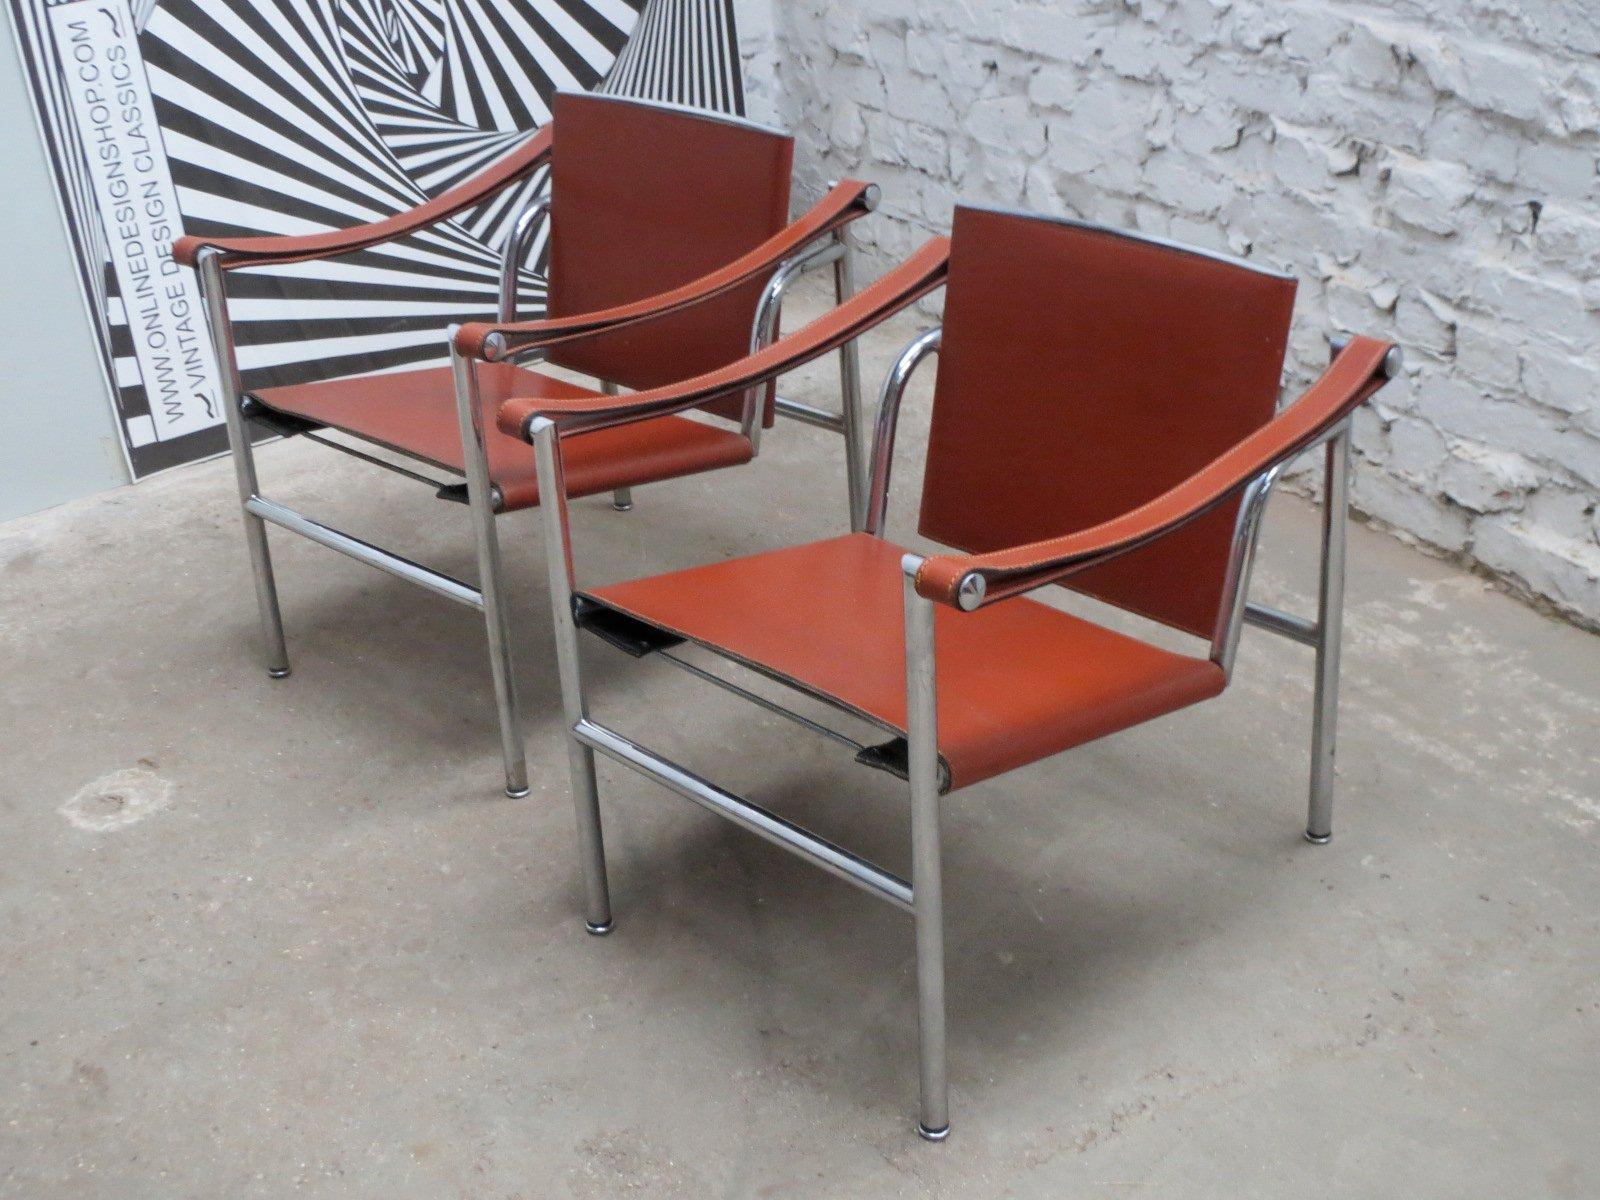 chaise basculant lc1 moderniste par le corbusier pierre jeanneret and charlotte perriand pour. Black Bedroom Furniture Sets. Home Design Ideas